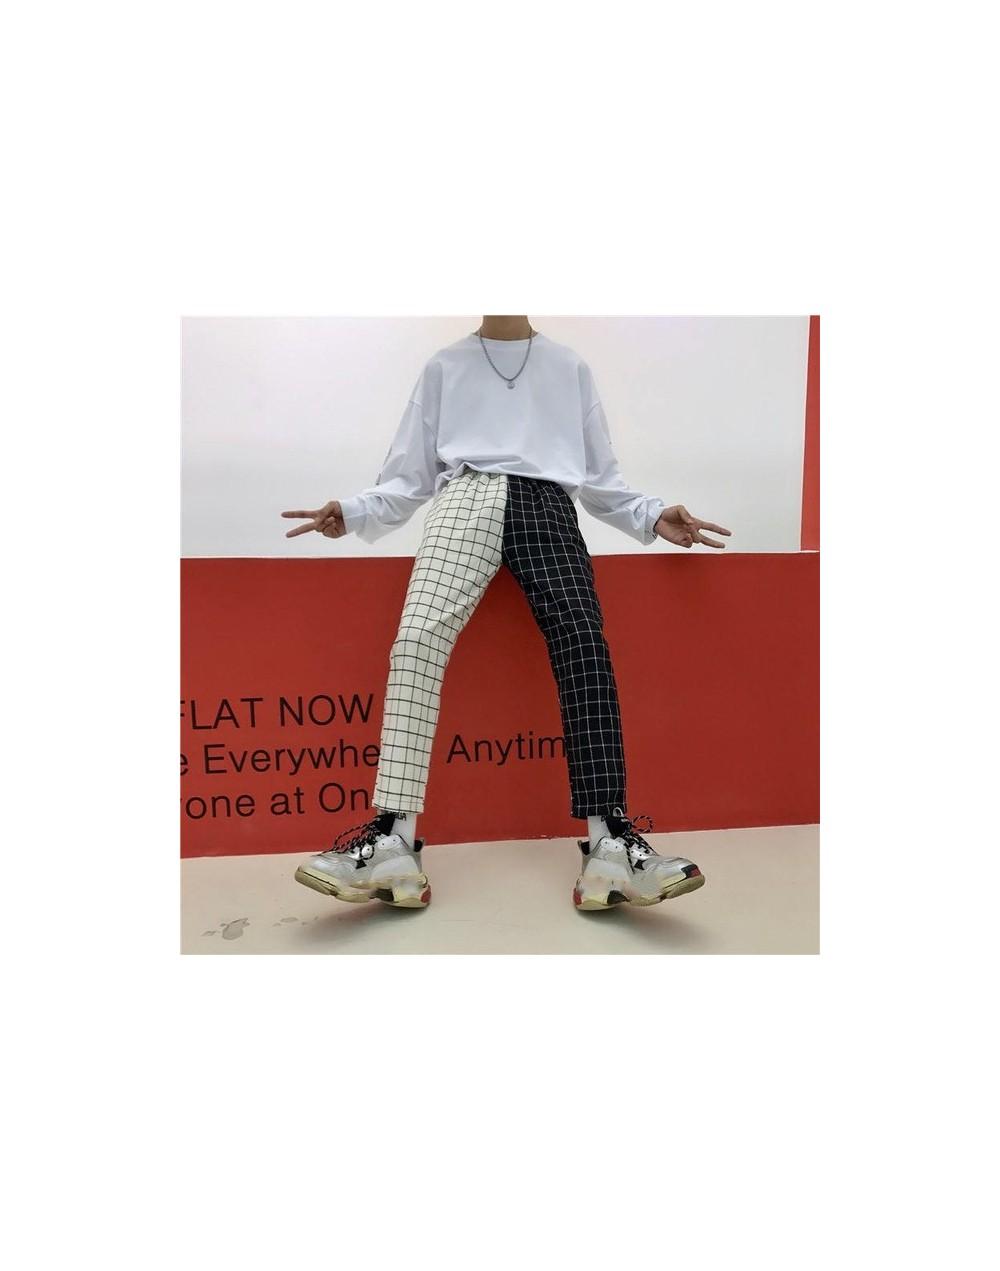 Vintage Paid Patchwork Pants Harajuku Woman Man Trousers Elastics High Waist Pants Korean Causal Straight Pants 37403 - whit...